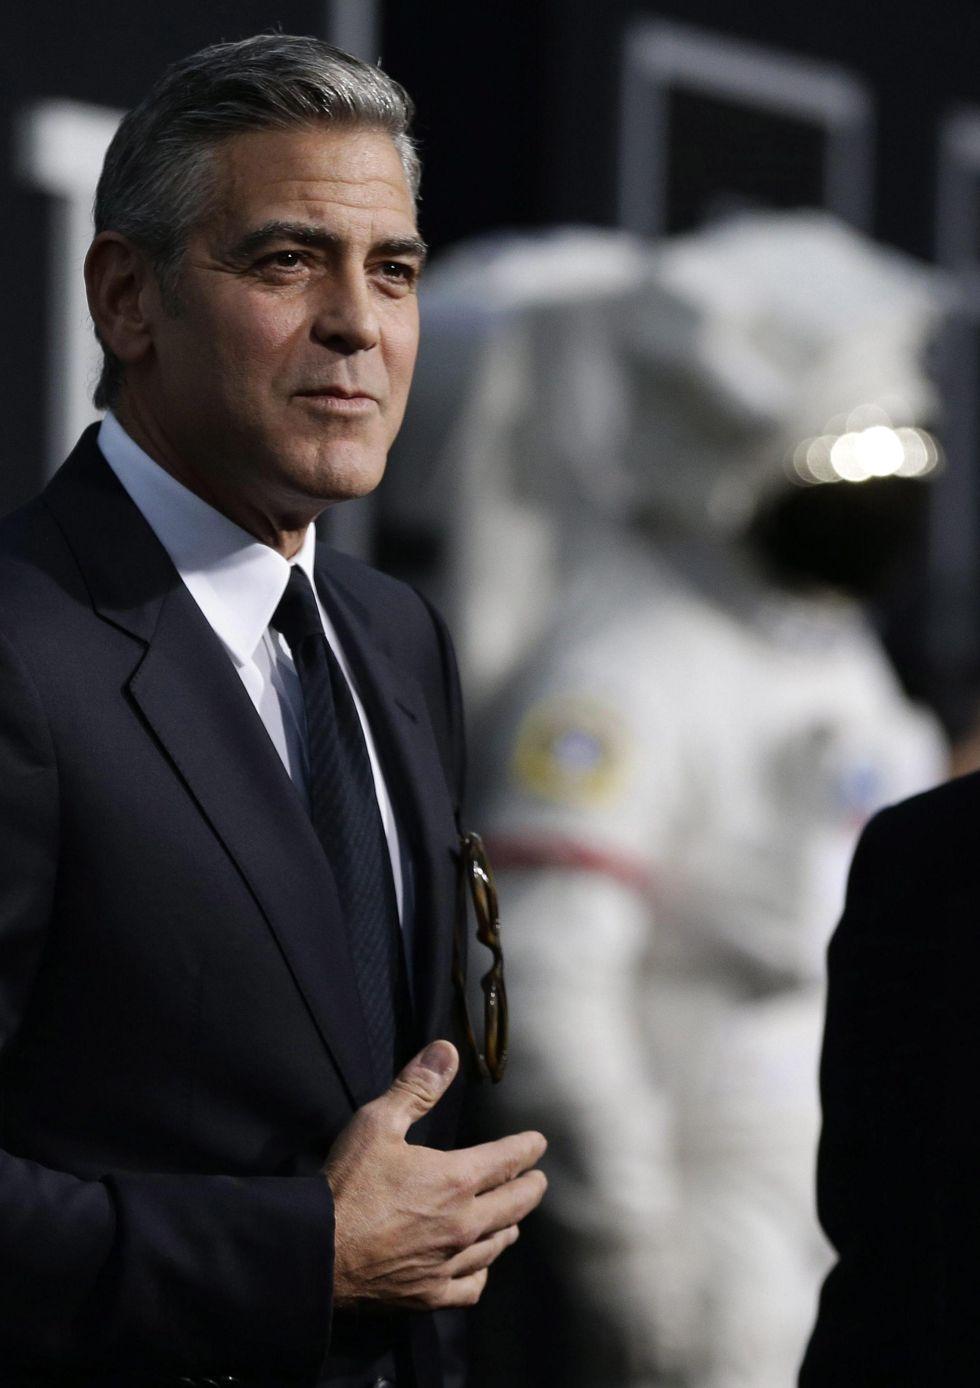 George Clooney rompe le regole del buon vicinato ad Hollywood